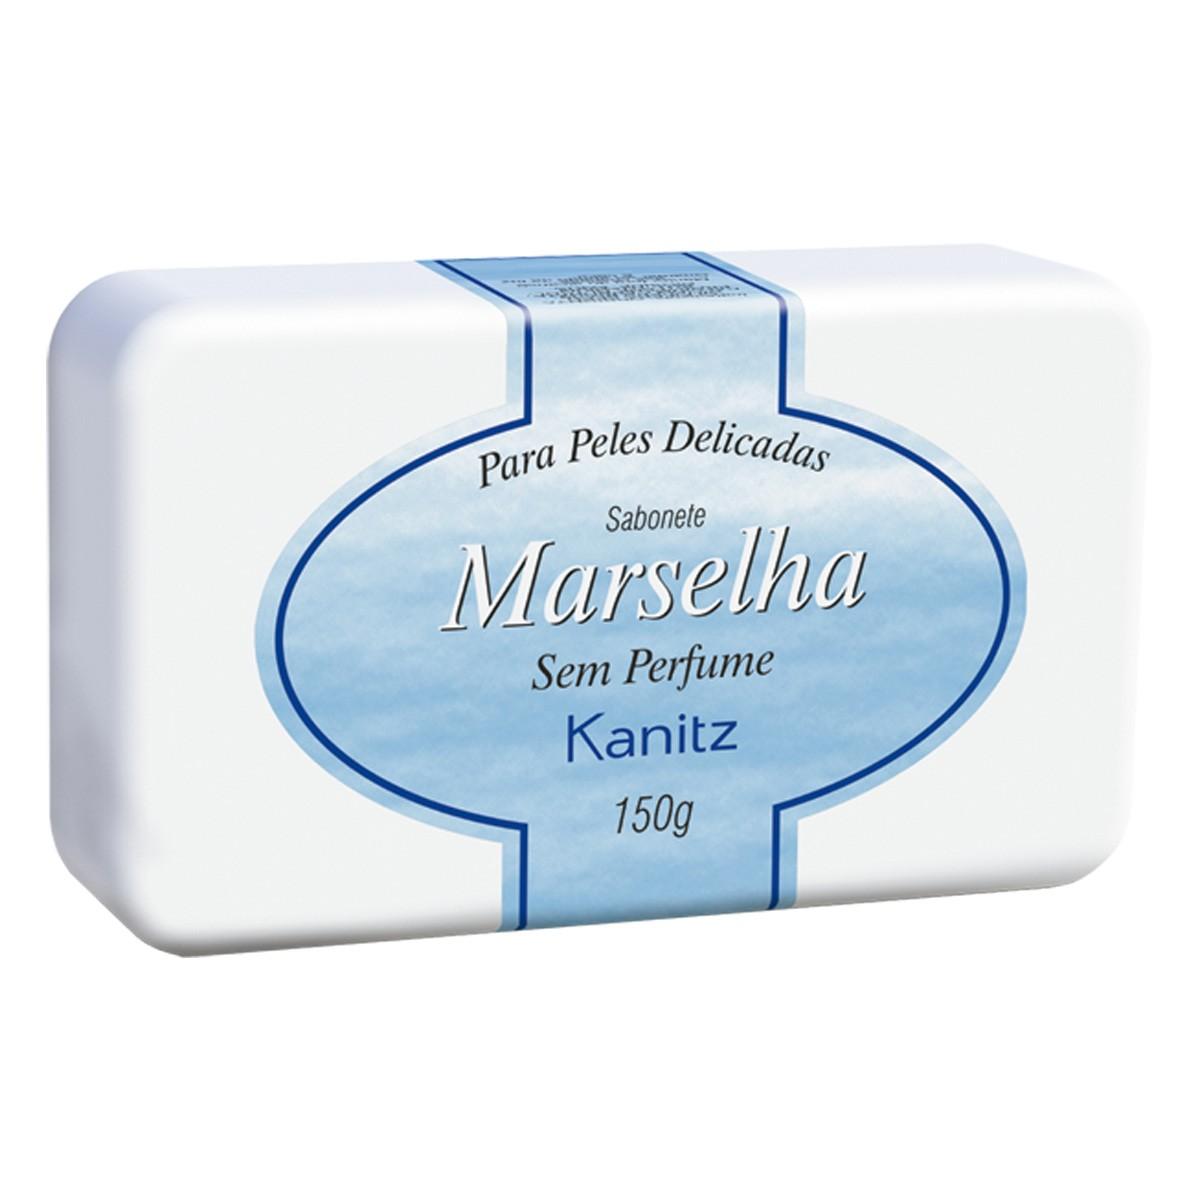 Sabonete Tratamento Marselha 150g S/perfume